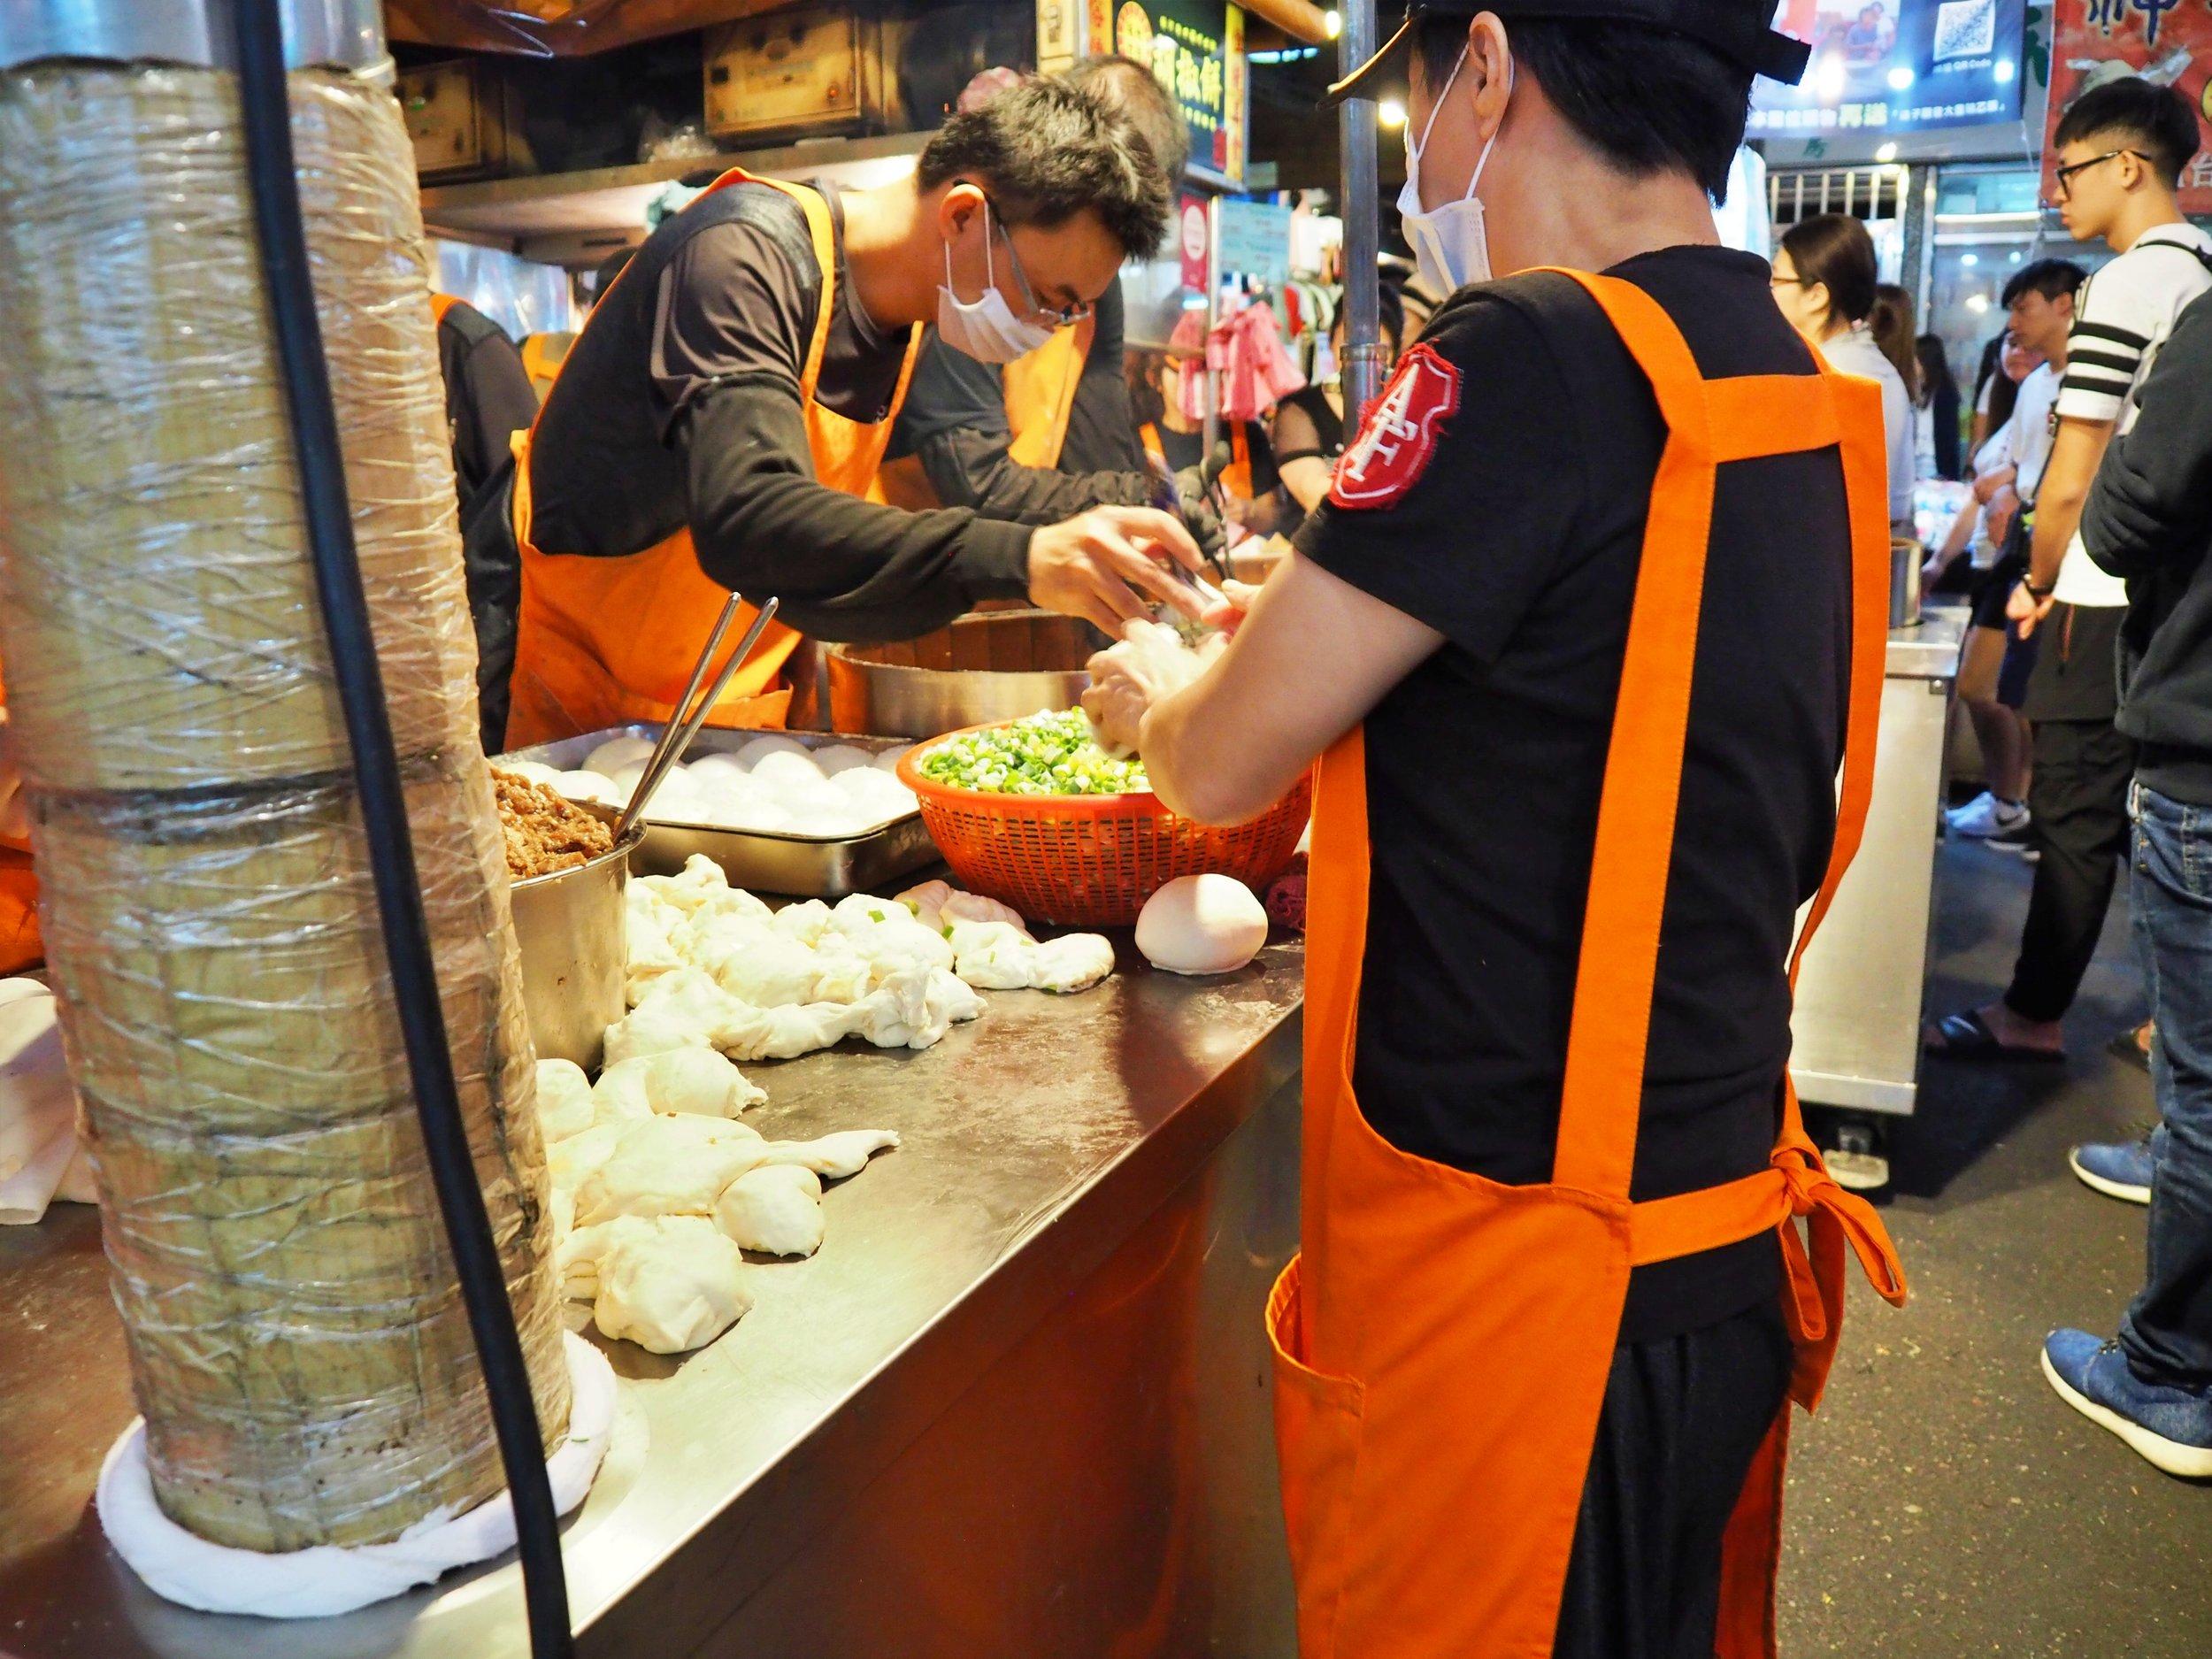 Vendors wearing face masks and everything at Ruifang night market in Taiwan